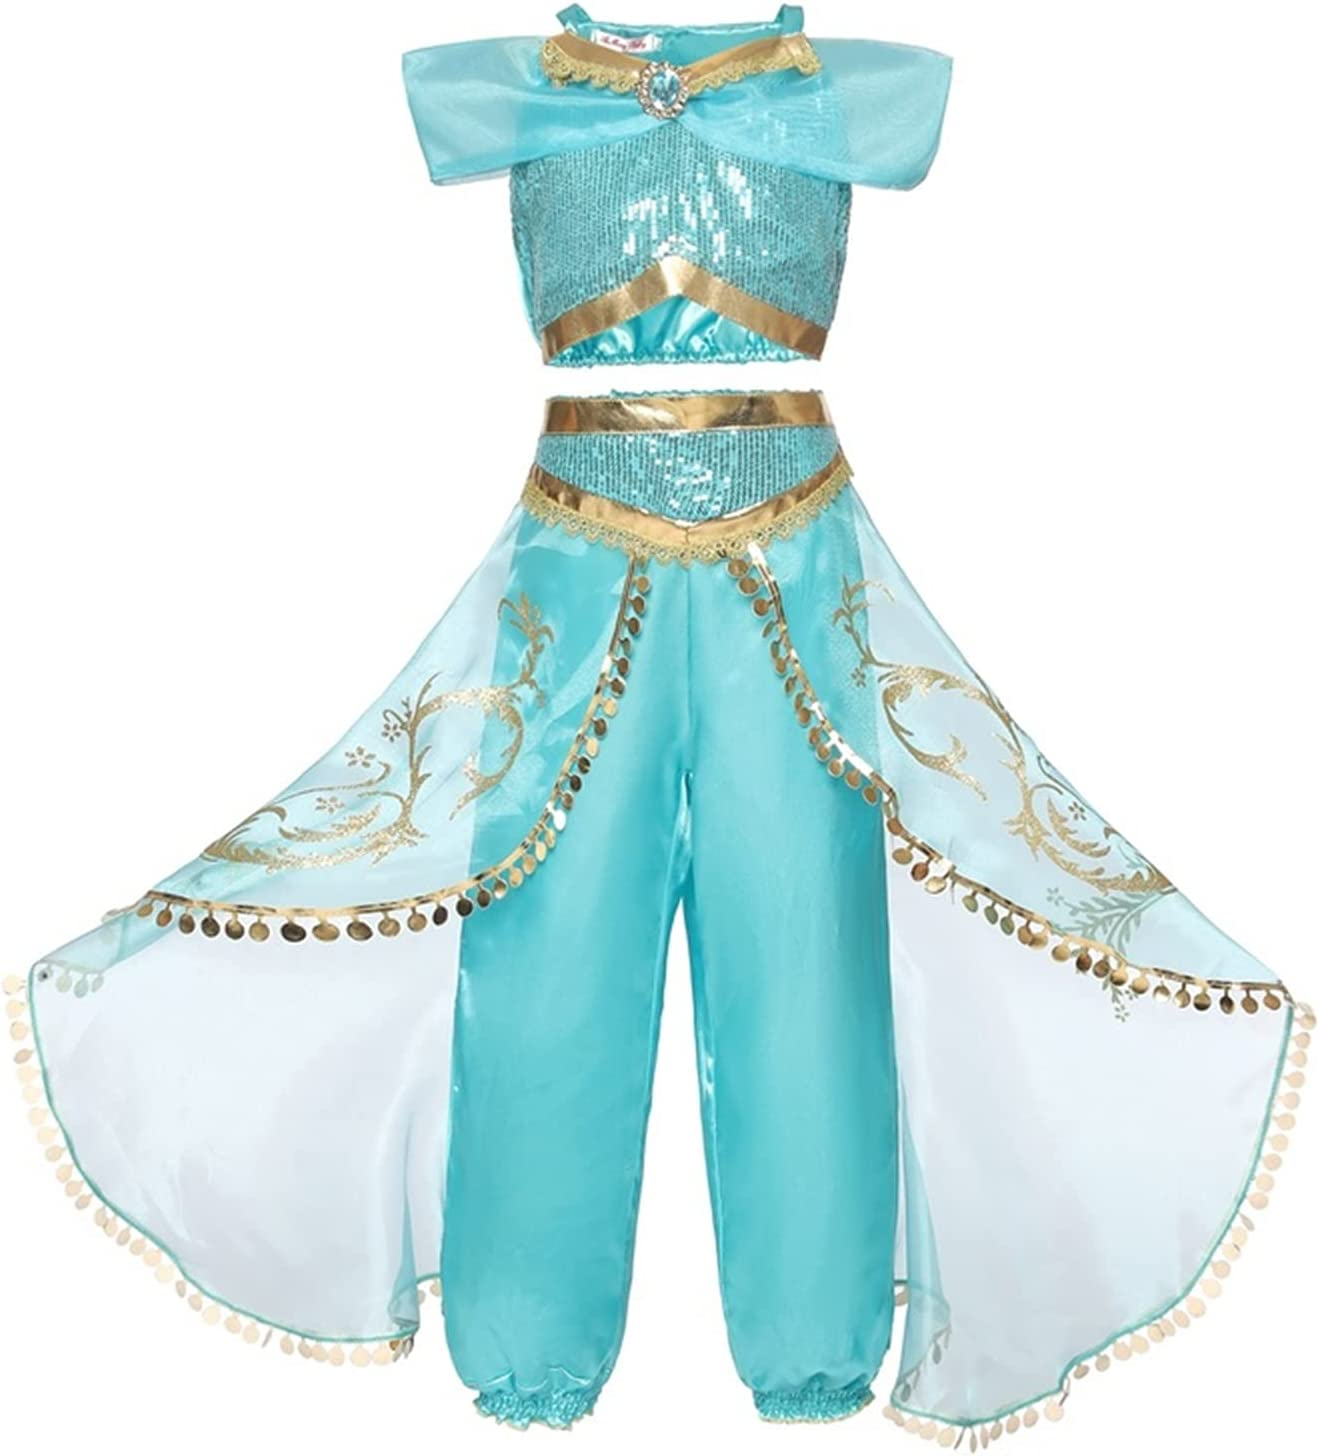 BIVJX Girls' Dresses Girls Princess Ranking integrated 1st Price reduction place Costume Halloween Birt Dress